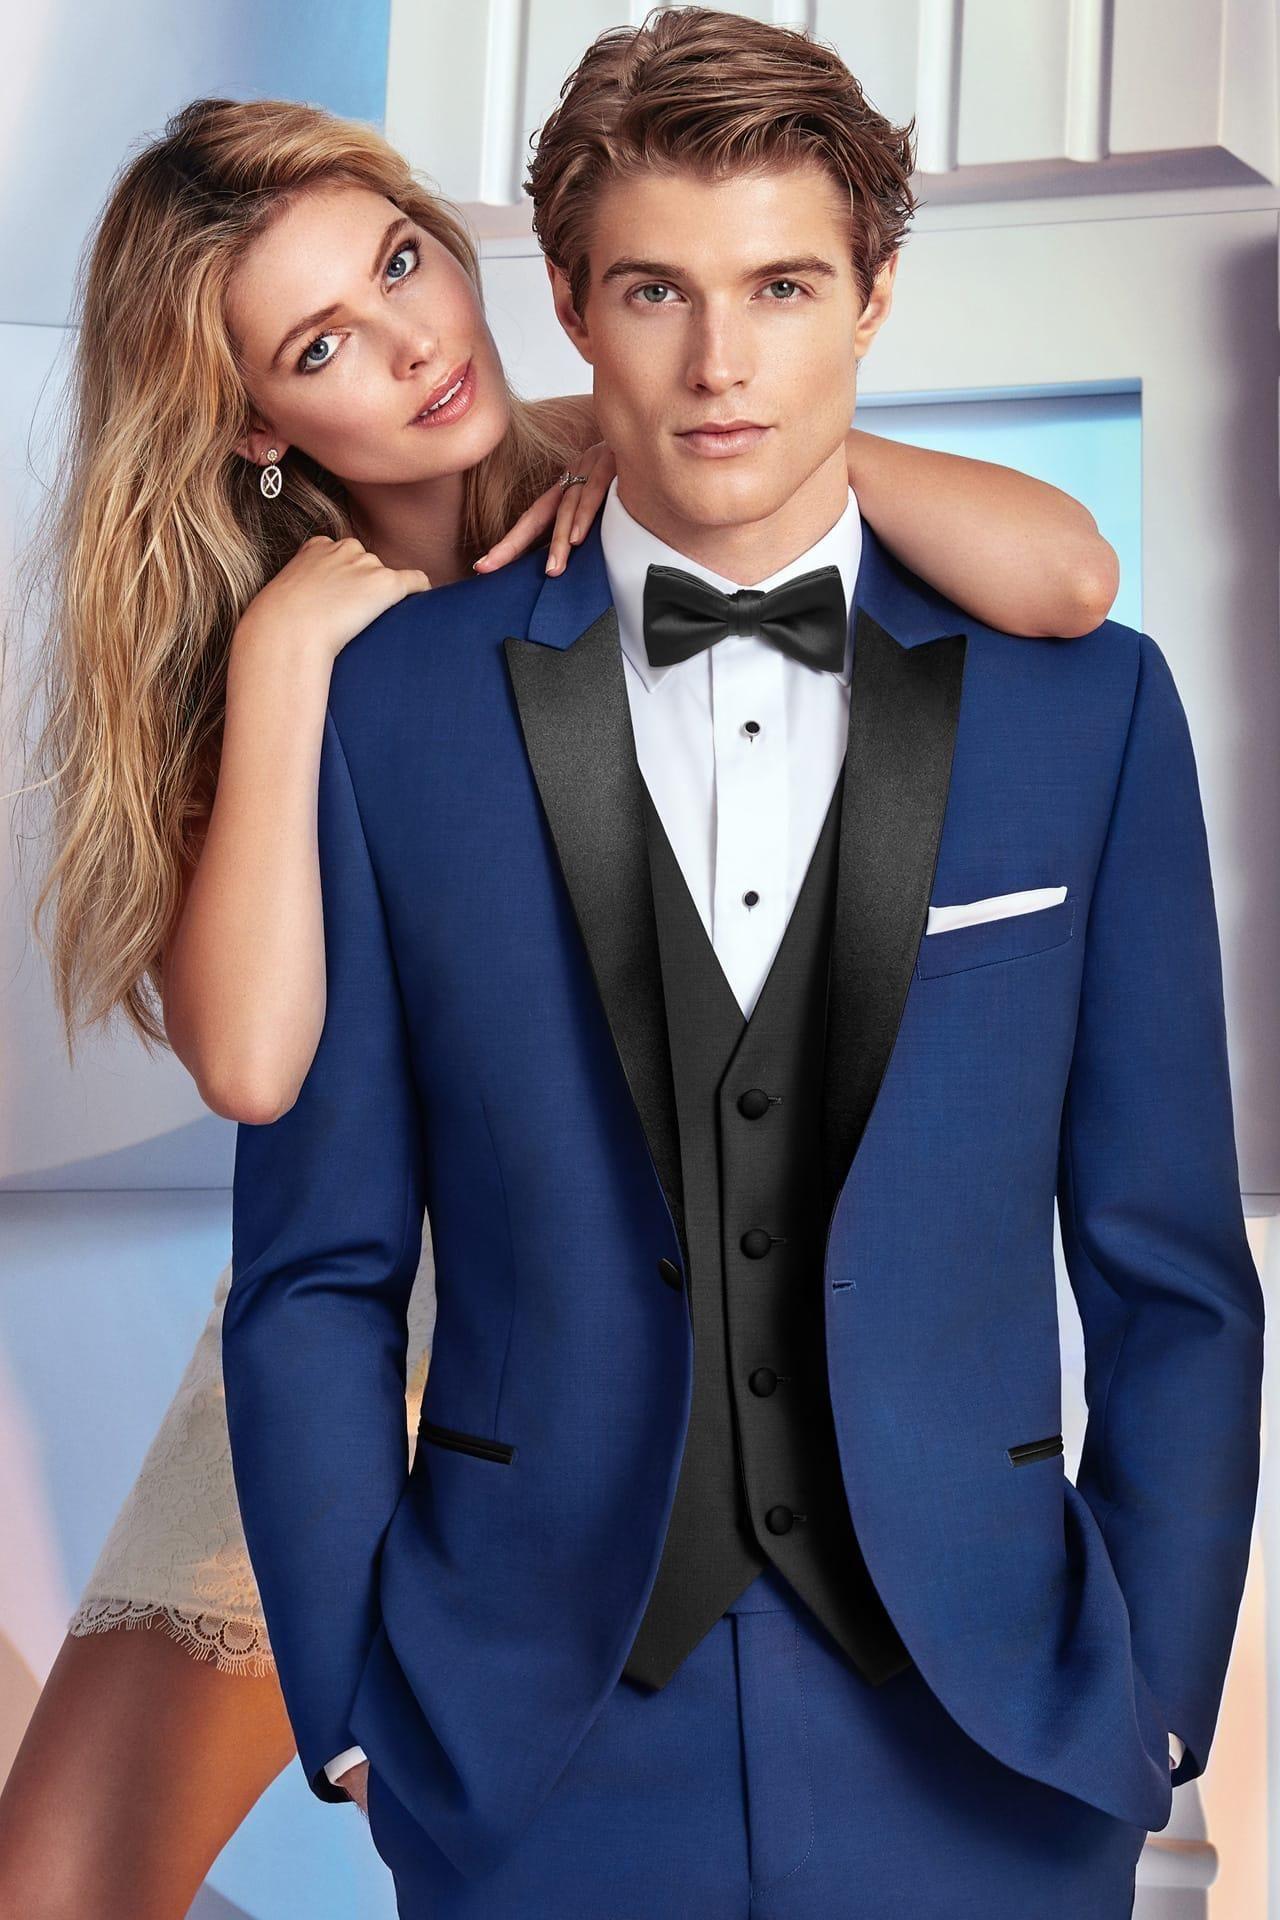 6951219b07868 Nics wedding Prom Blazers, Tuxedo For Men, Slim Fit Tuxedo, Tuxedo Suit,